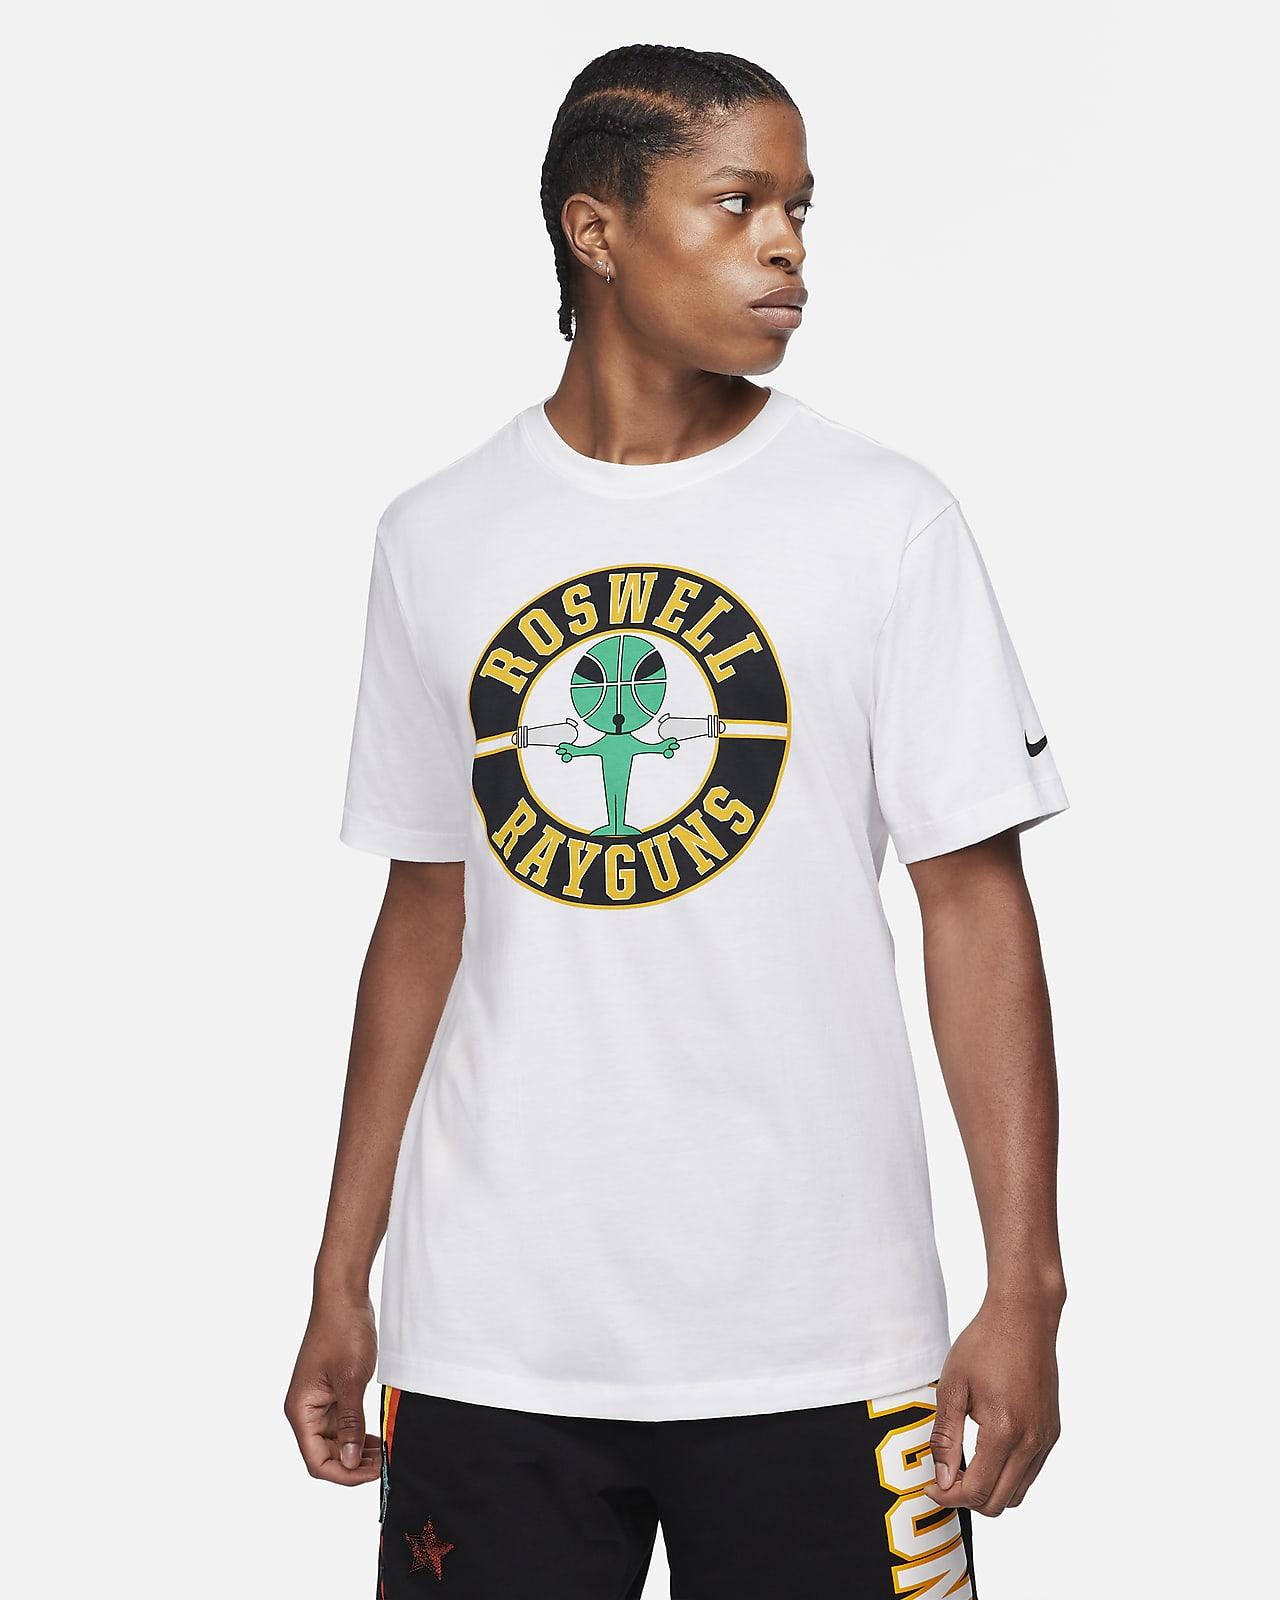 Nike Rayguns Men's Basketball T-Shirt